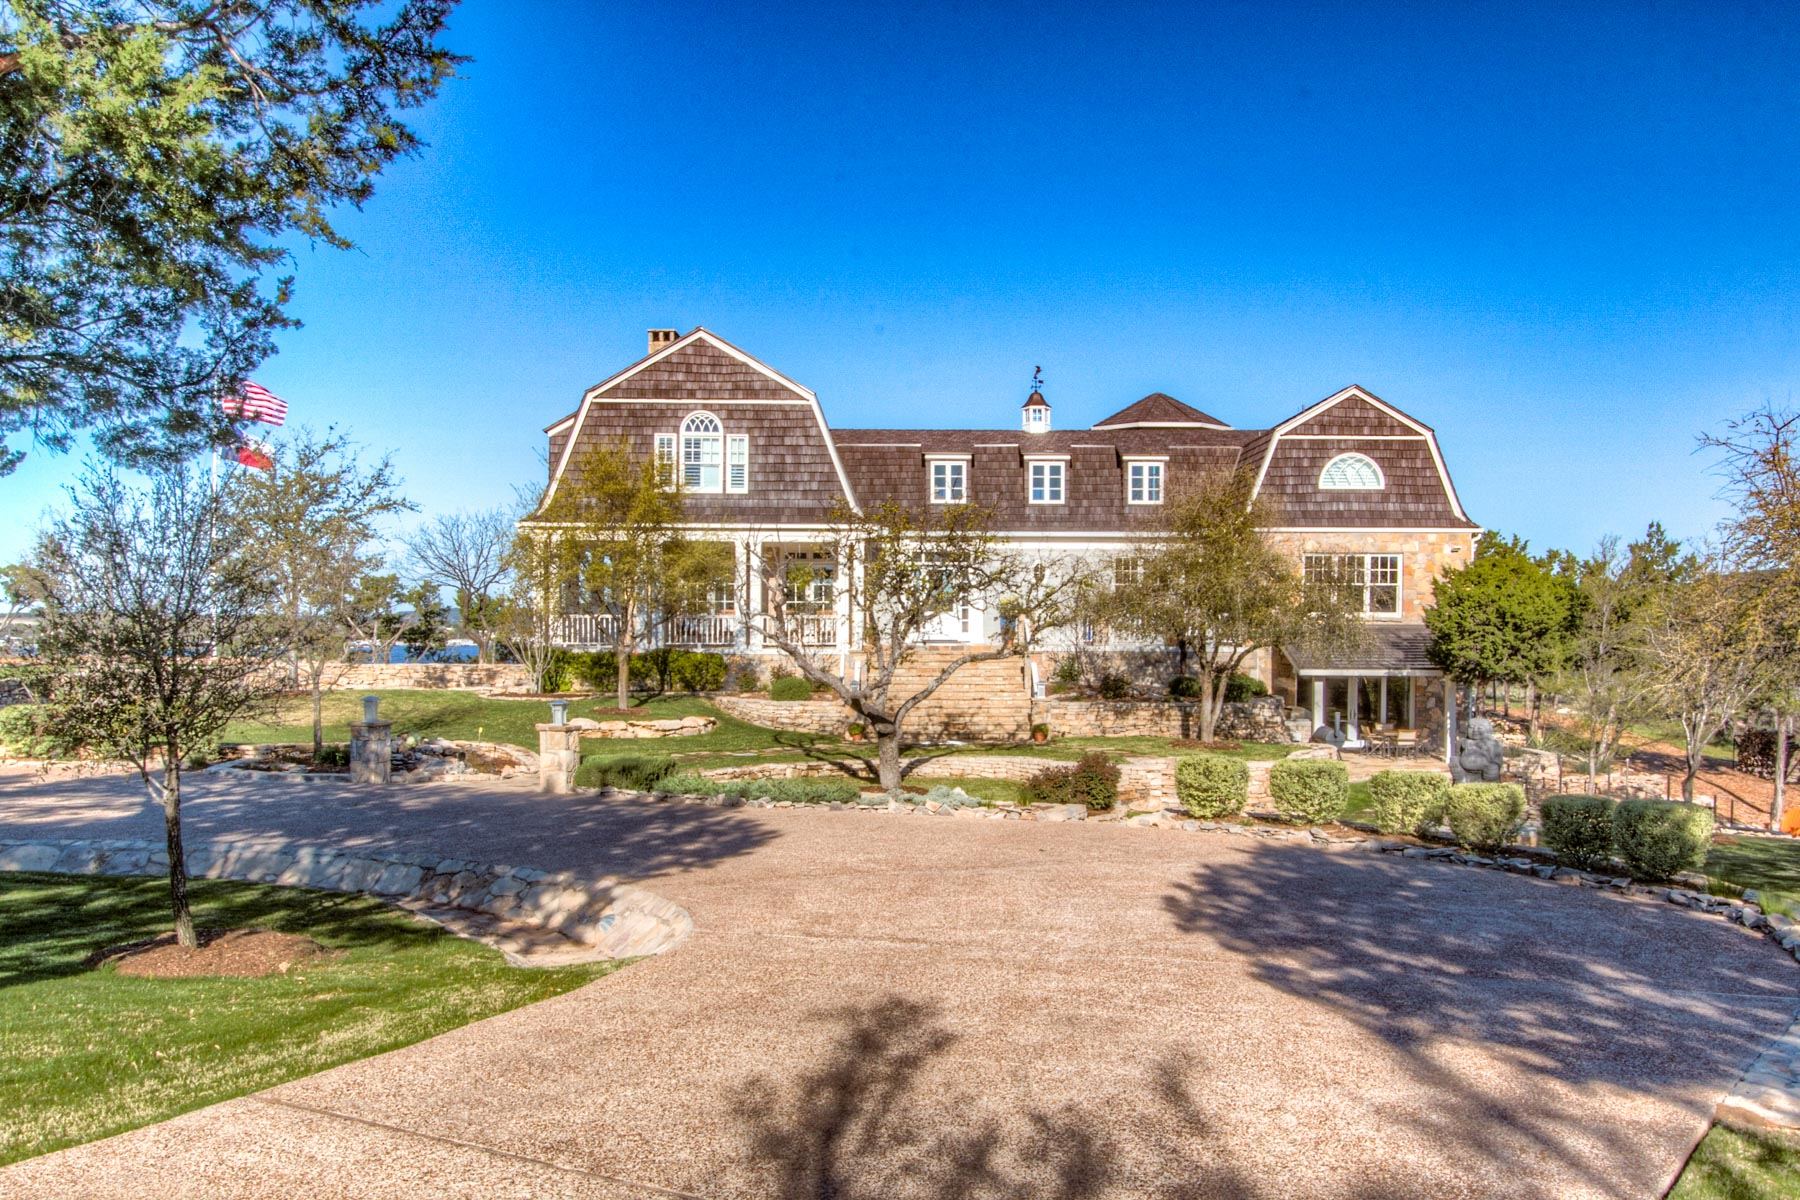 獨棟家庭住宅 為 出售 在 Possum Kingdom Lake front Home 1040 Sunset Circle Graford, 德克薩斯州, 76449 美國